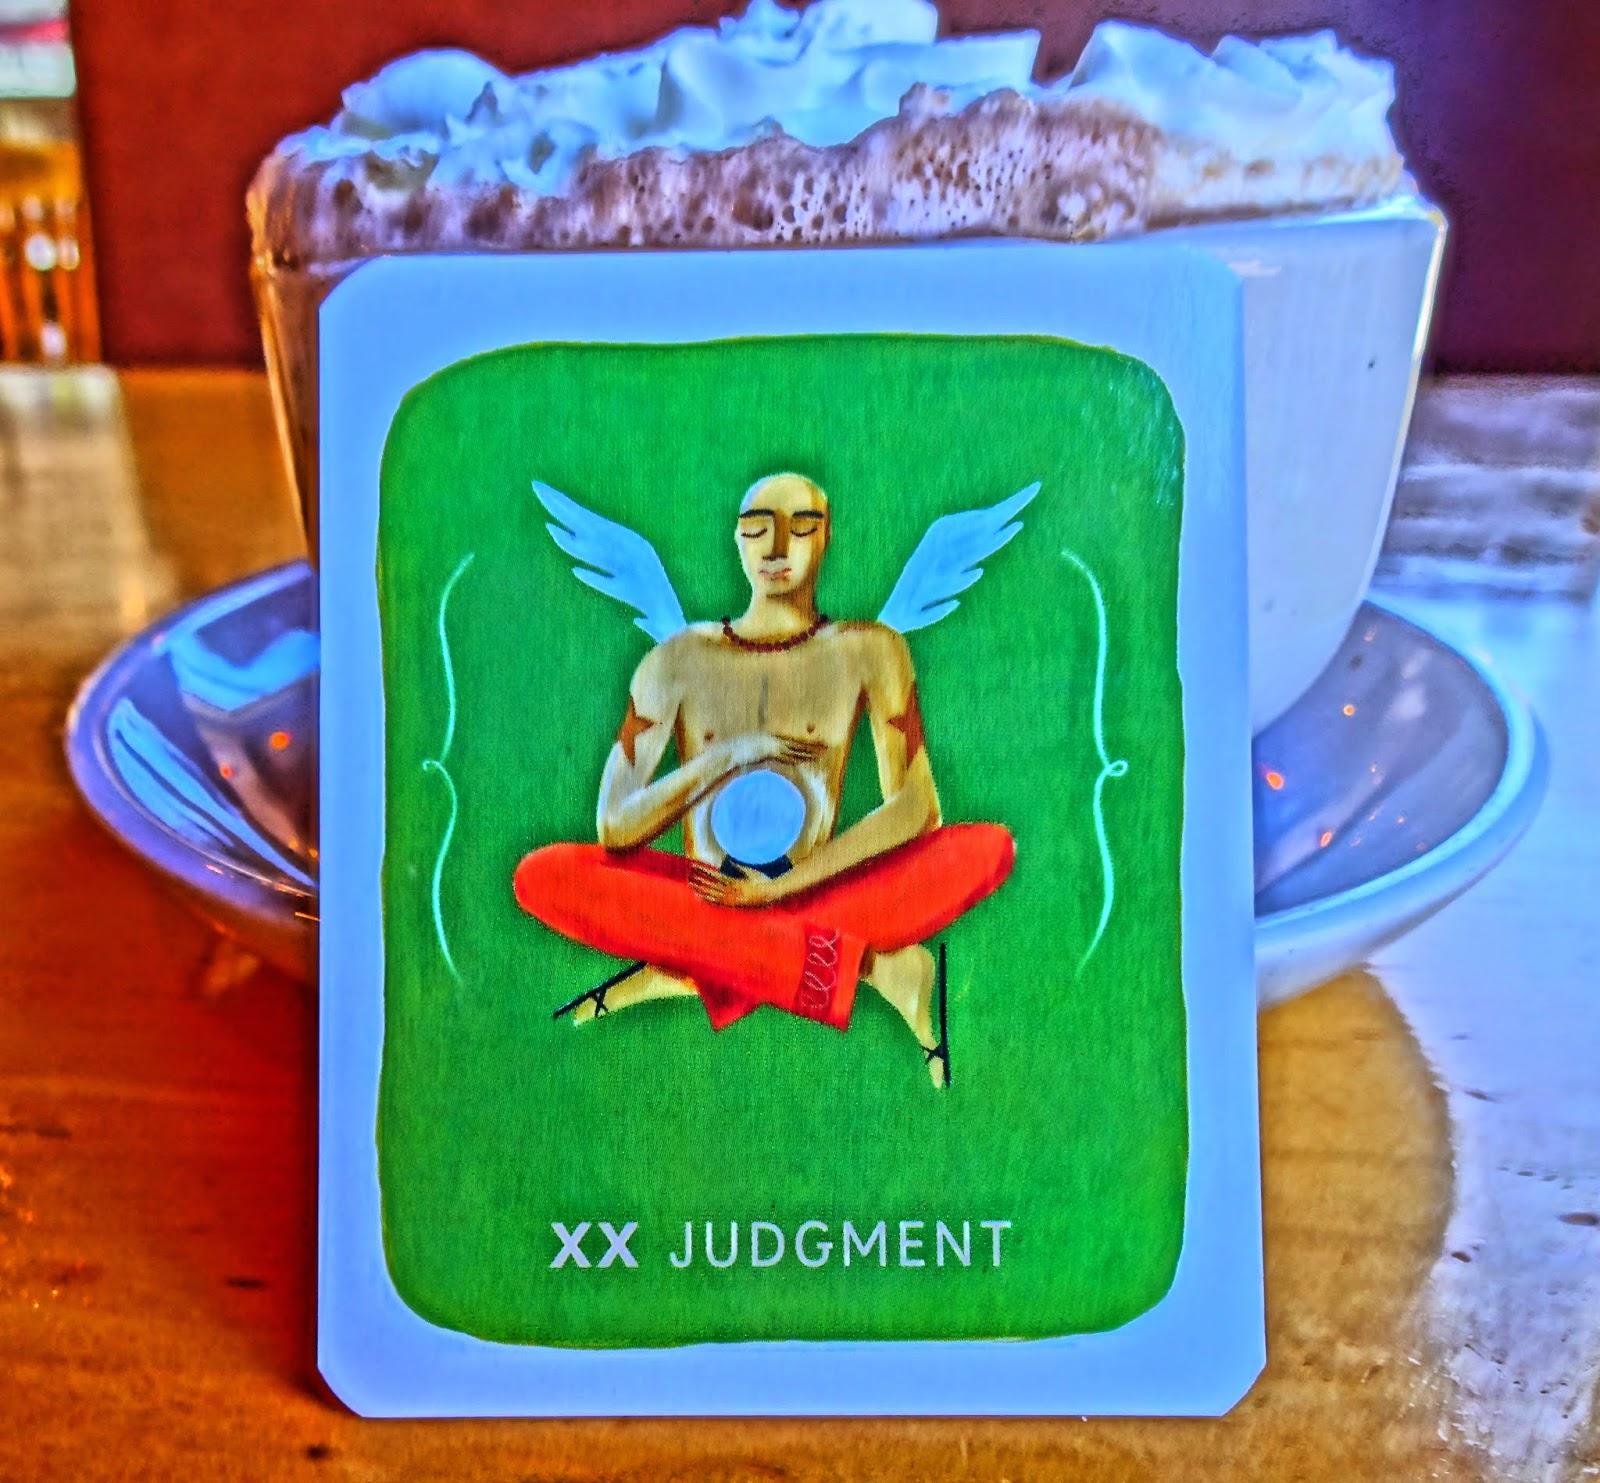 XX Judgement leaning against mug of hot chocolate